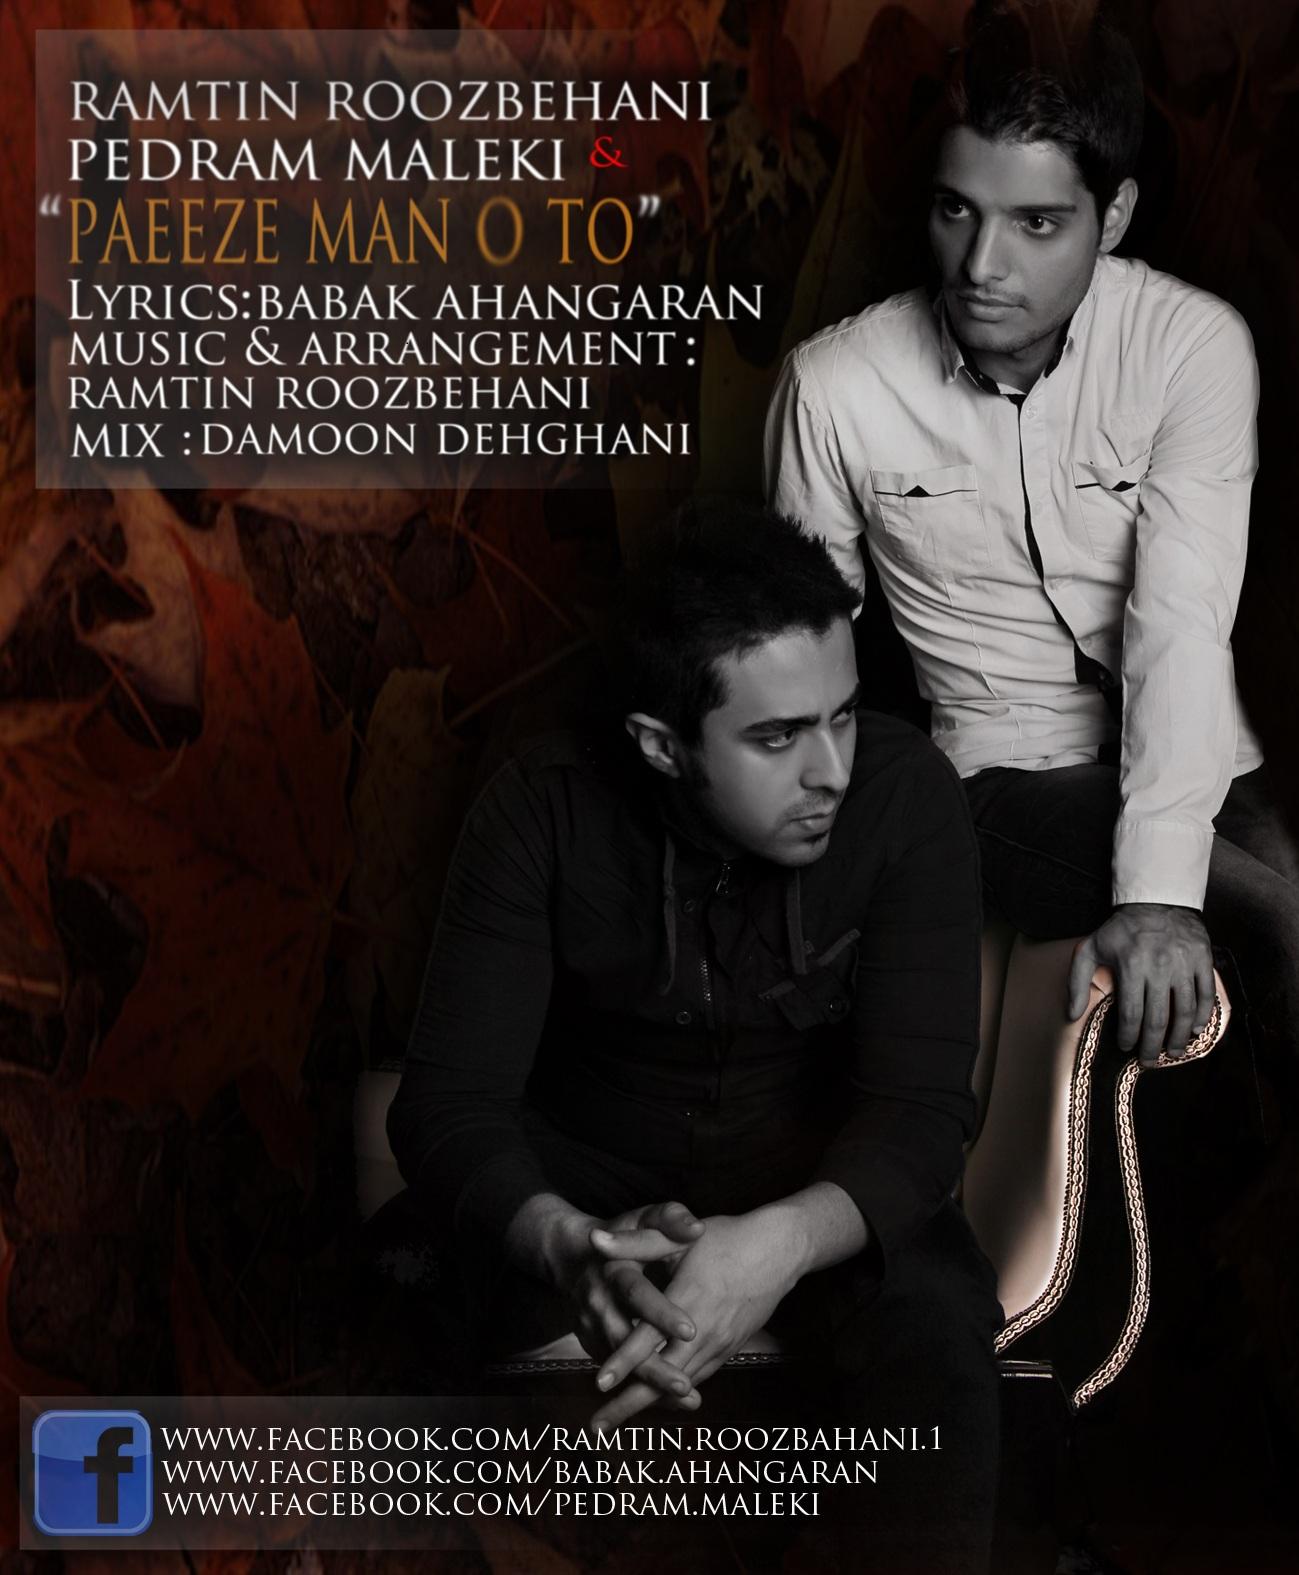 Ramtin-Roozbehani-Pedram-Maleki-Paeeze-Mano-To